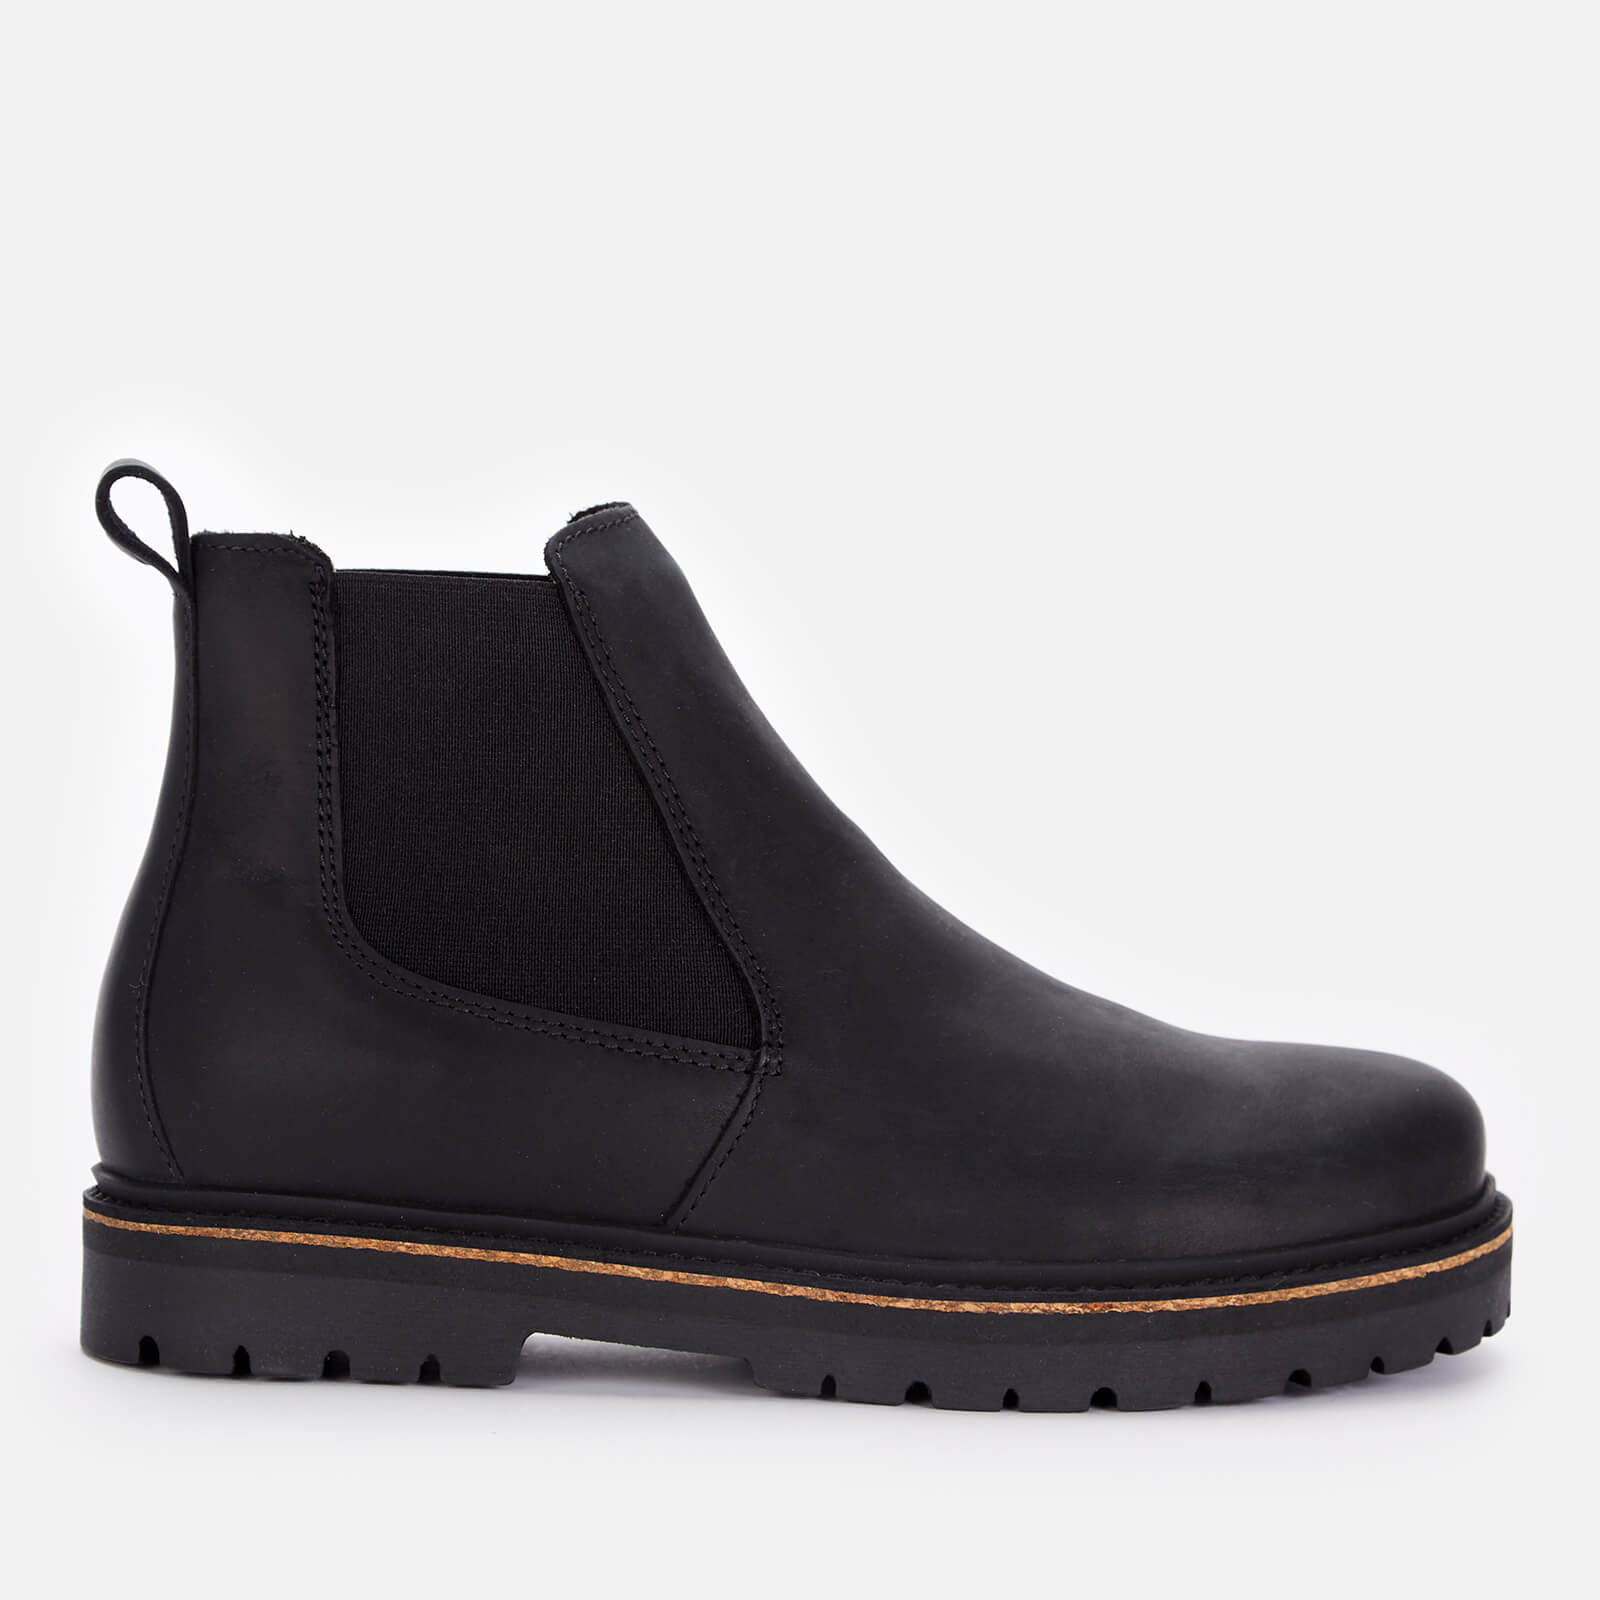 Birkenstock Women's Stalon Nubuck Chelsea Boots - Black - UK 8